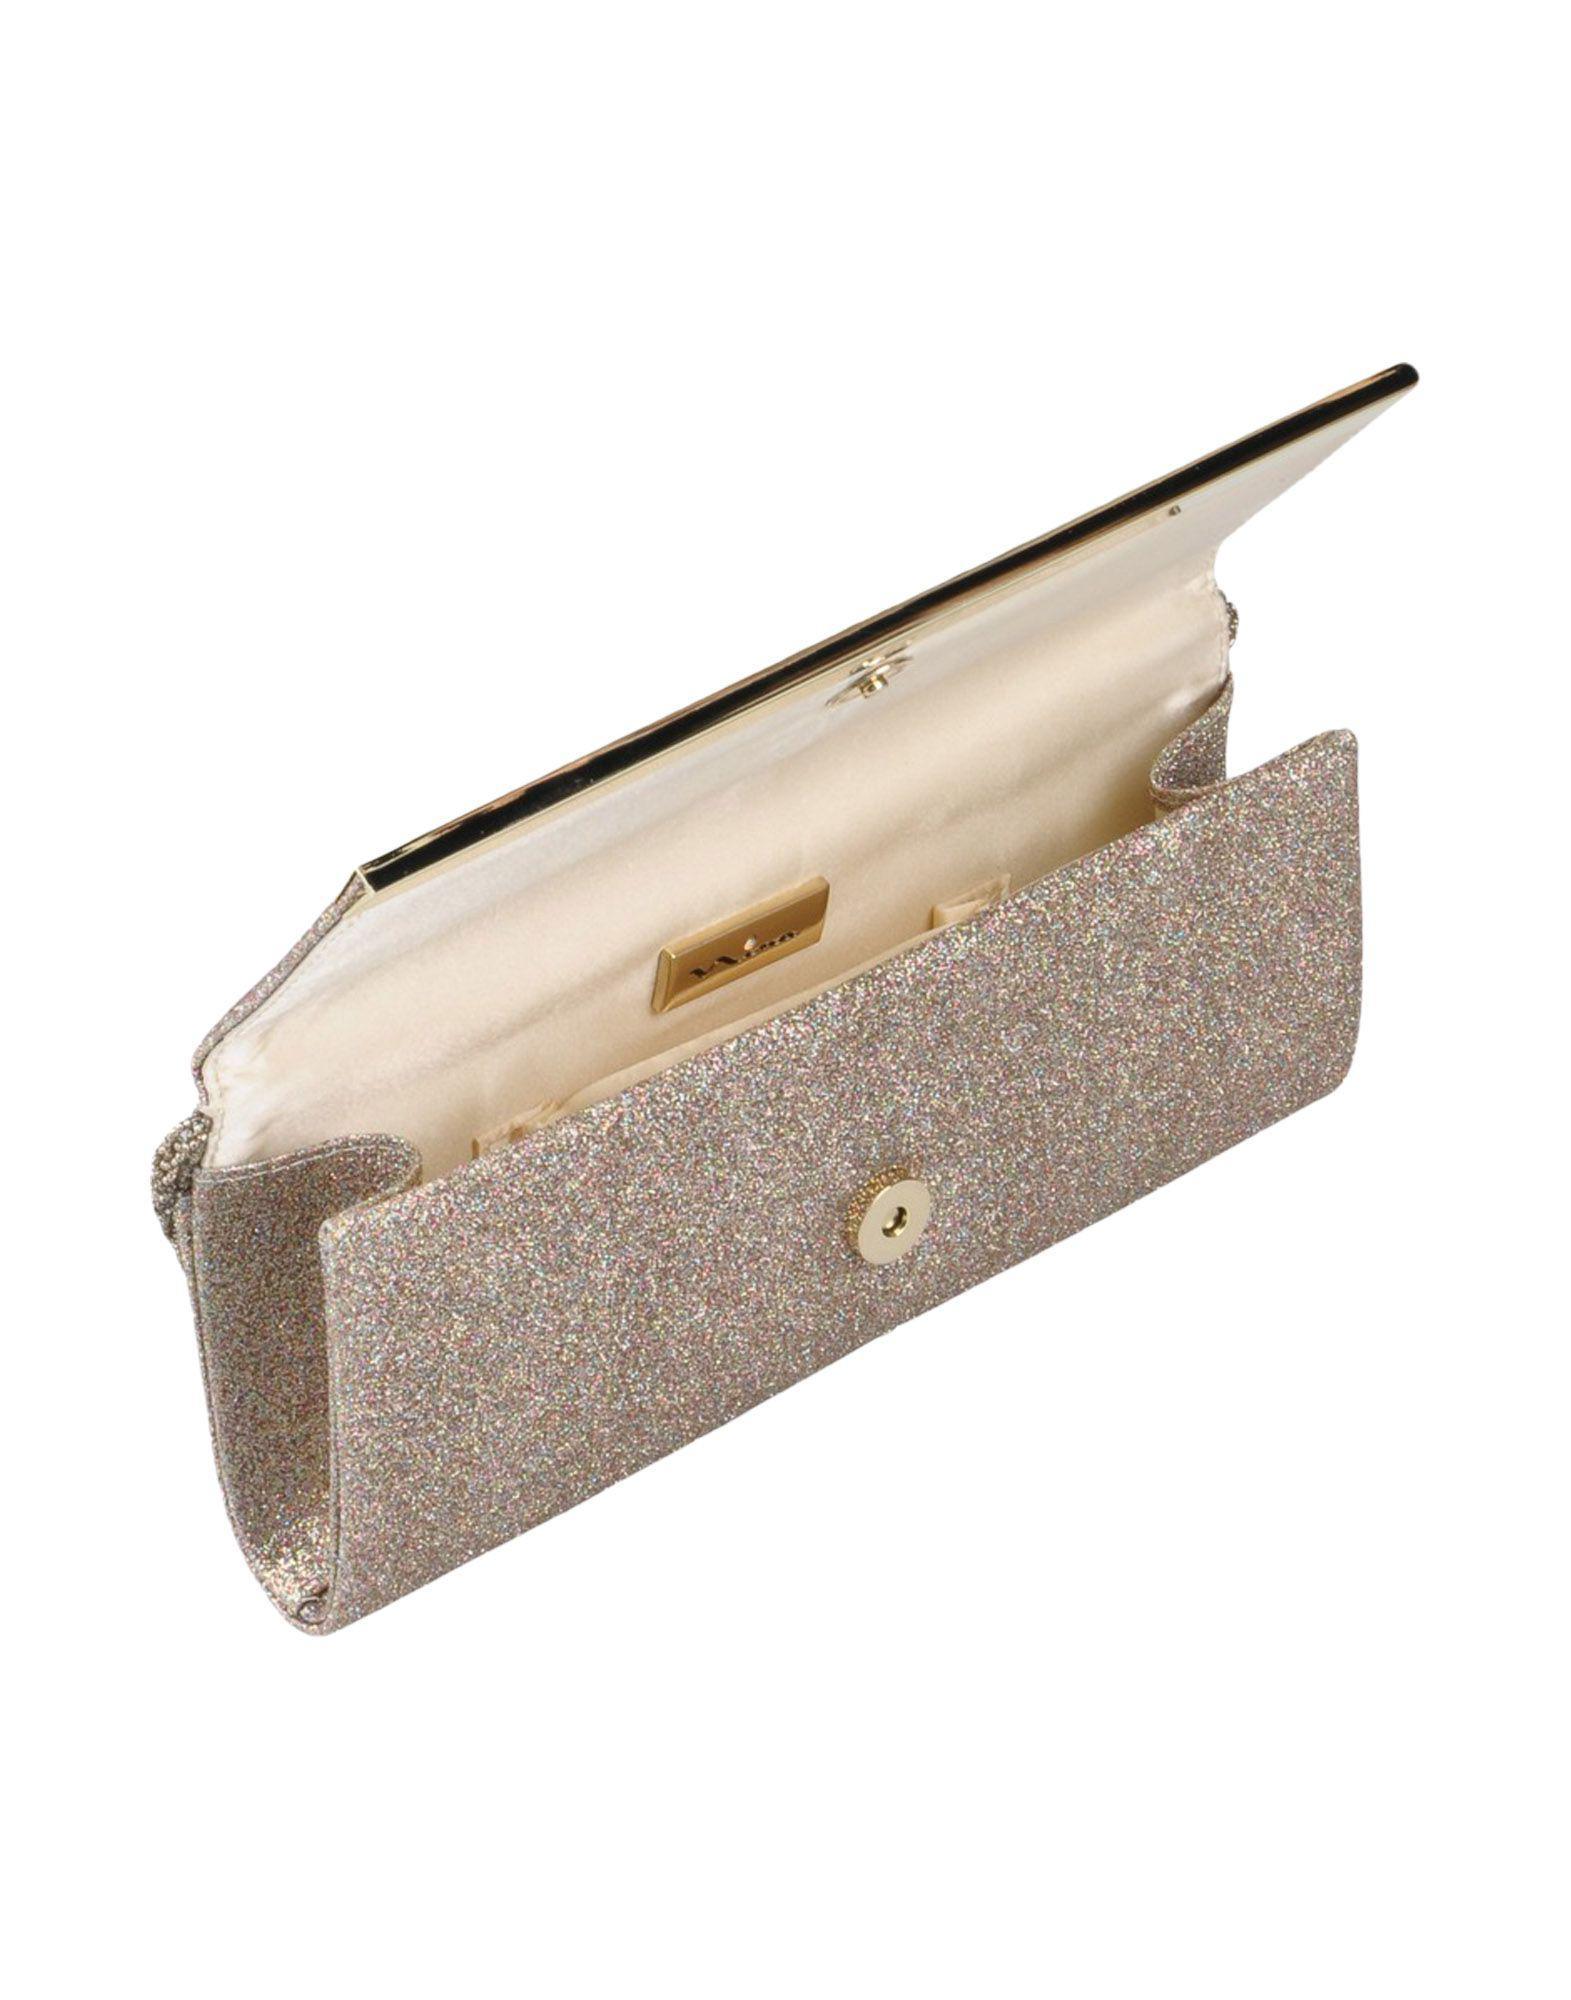 Nina Cross-body Bag in Gold (Metallic)